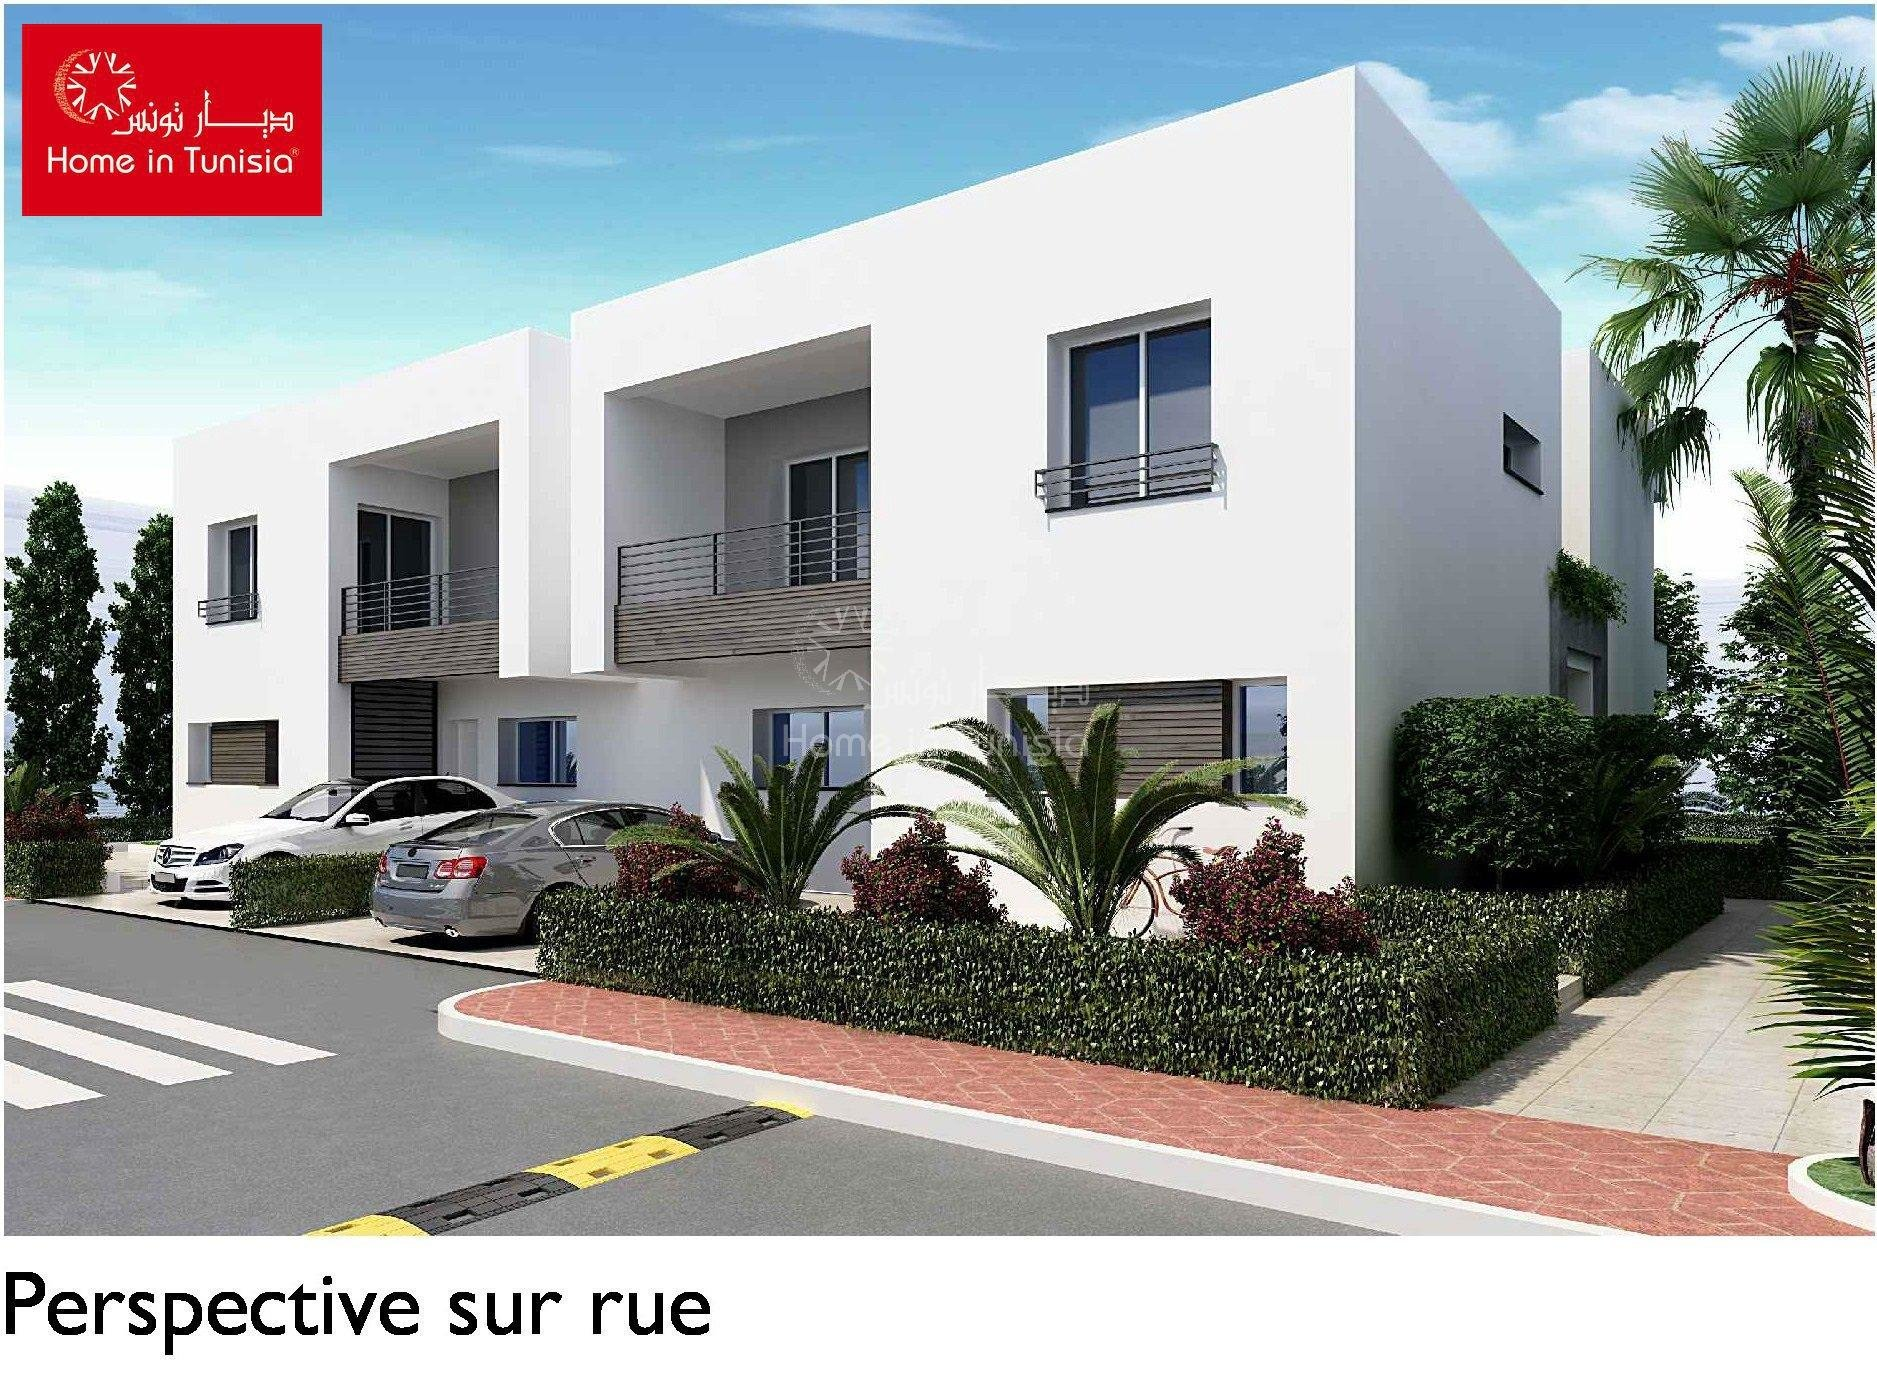 Tunis Bay résidentiel golf villa Oceanos jumelée 3 chambres terrasse jardin piscine privee